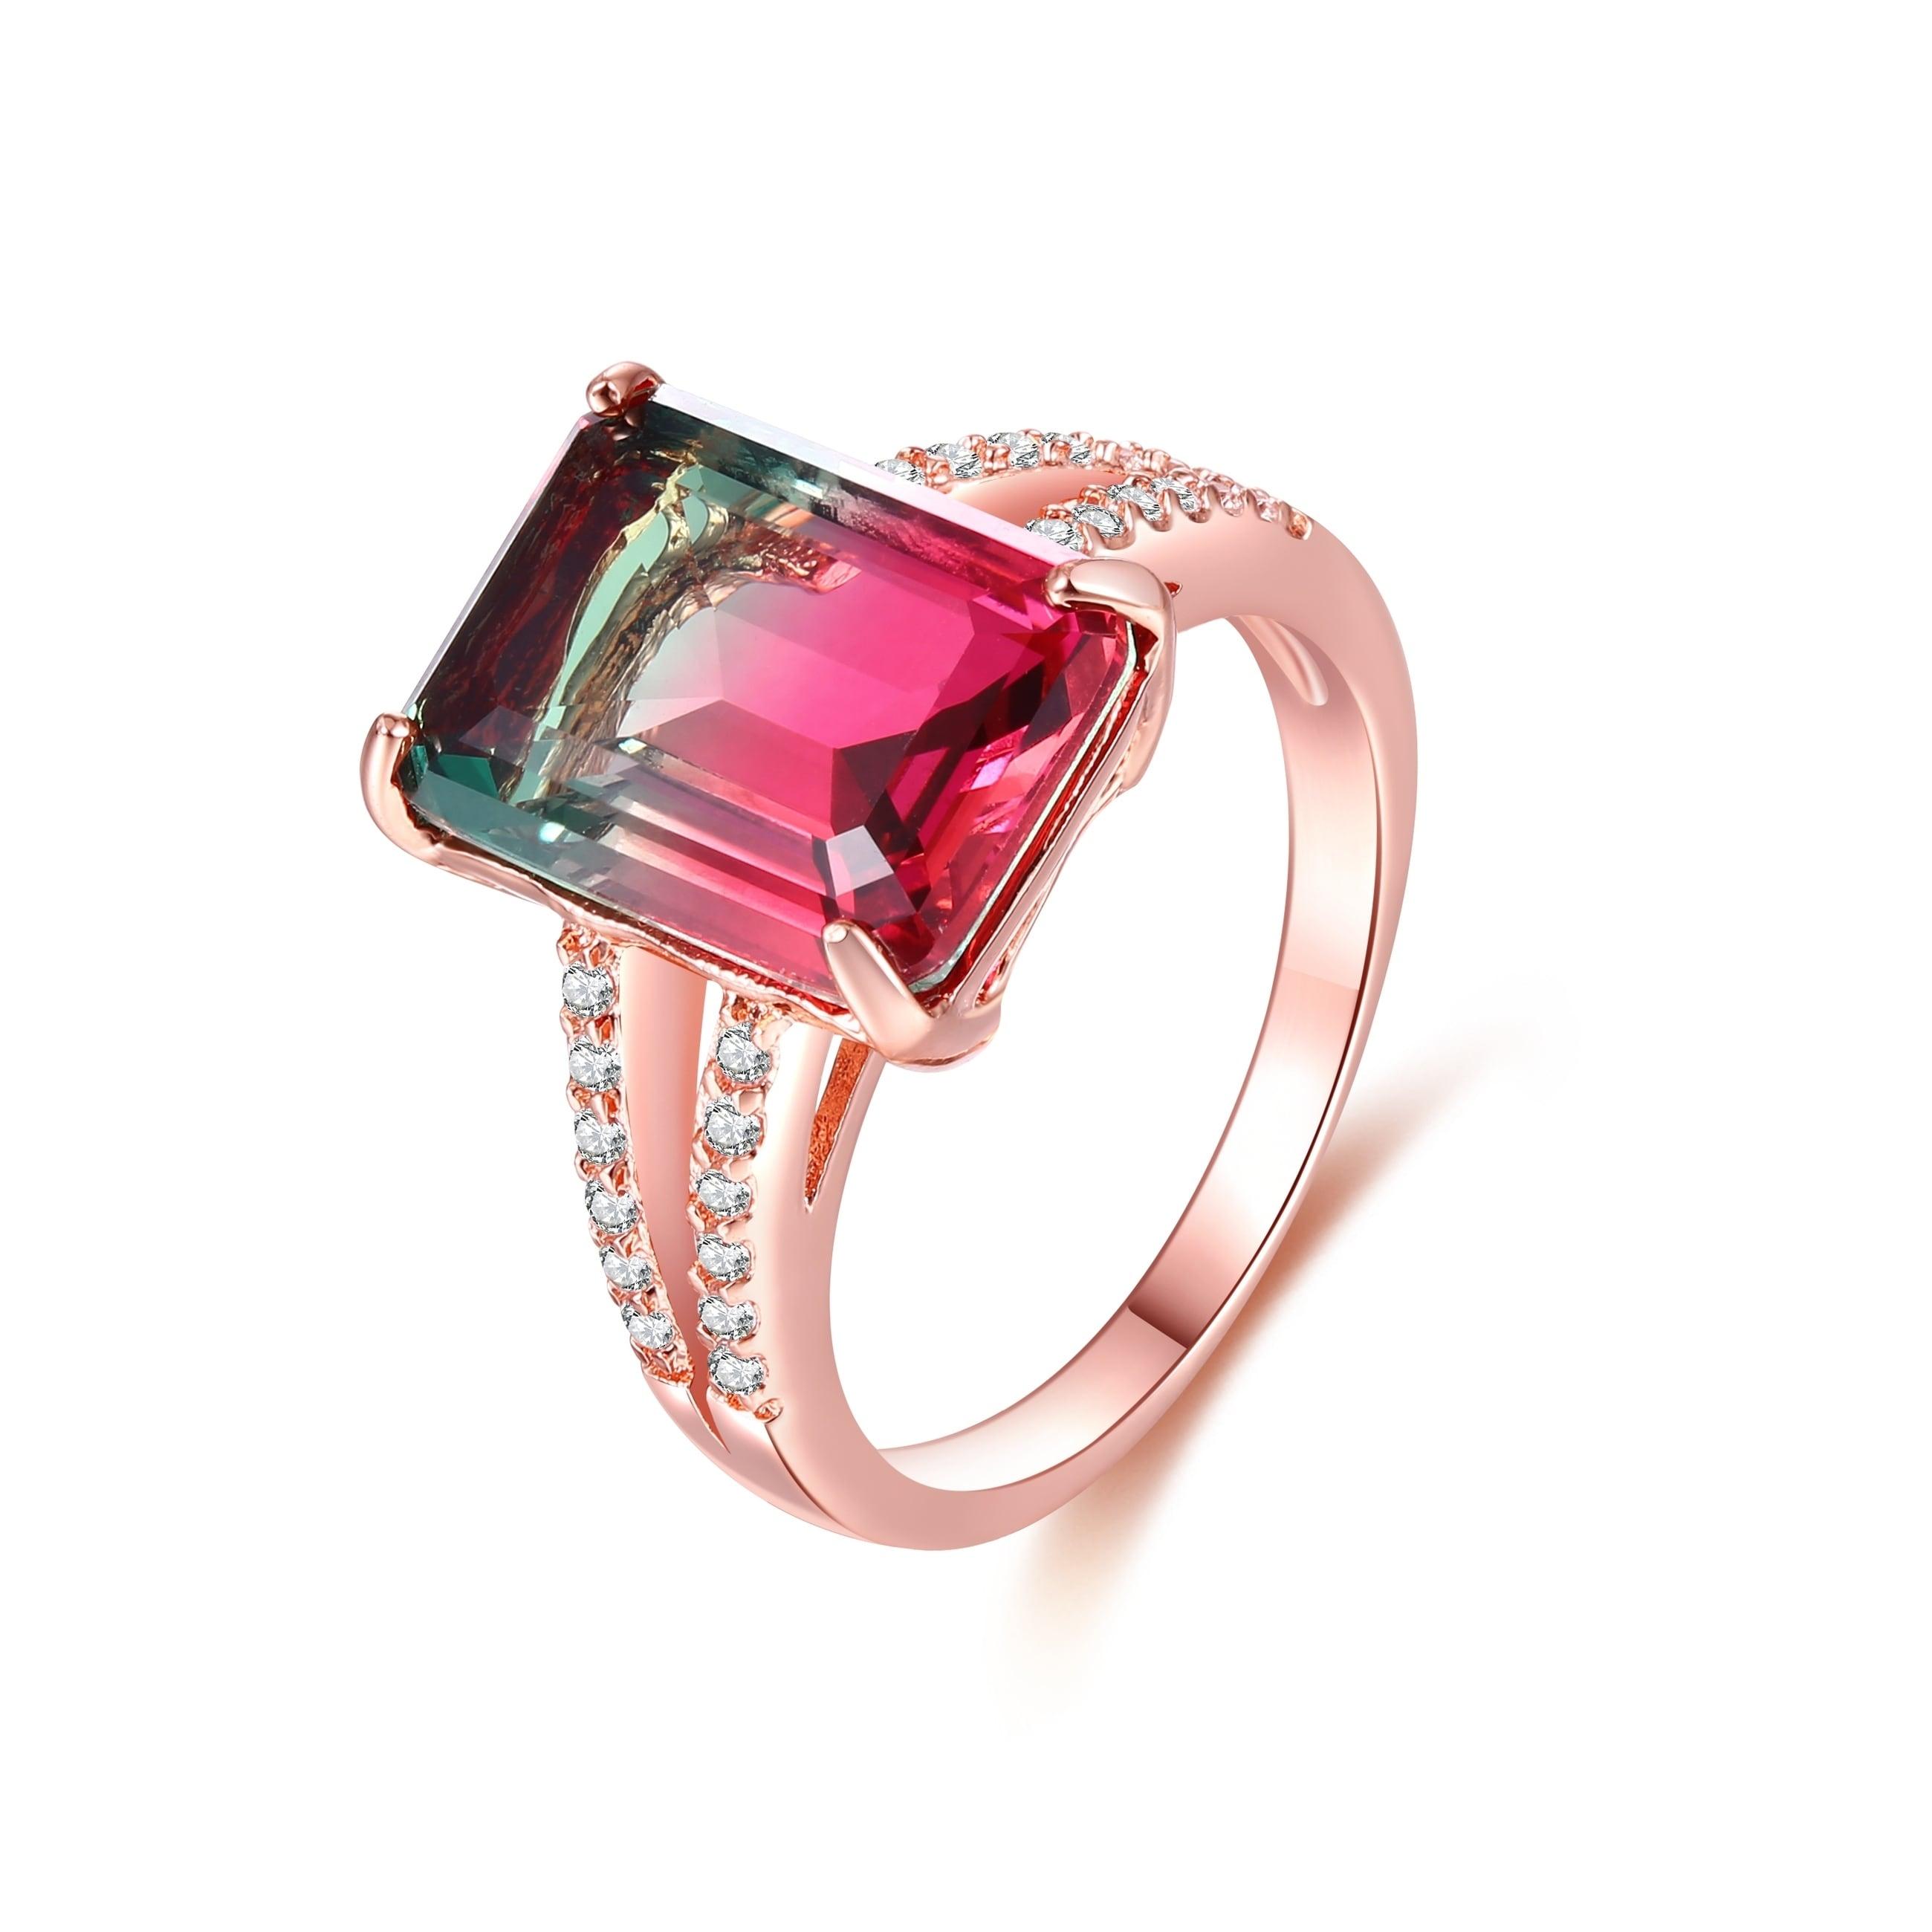 Rose Gold Plated Watermelon Quartz Emerald Cut Ring Overstock 19858366